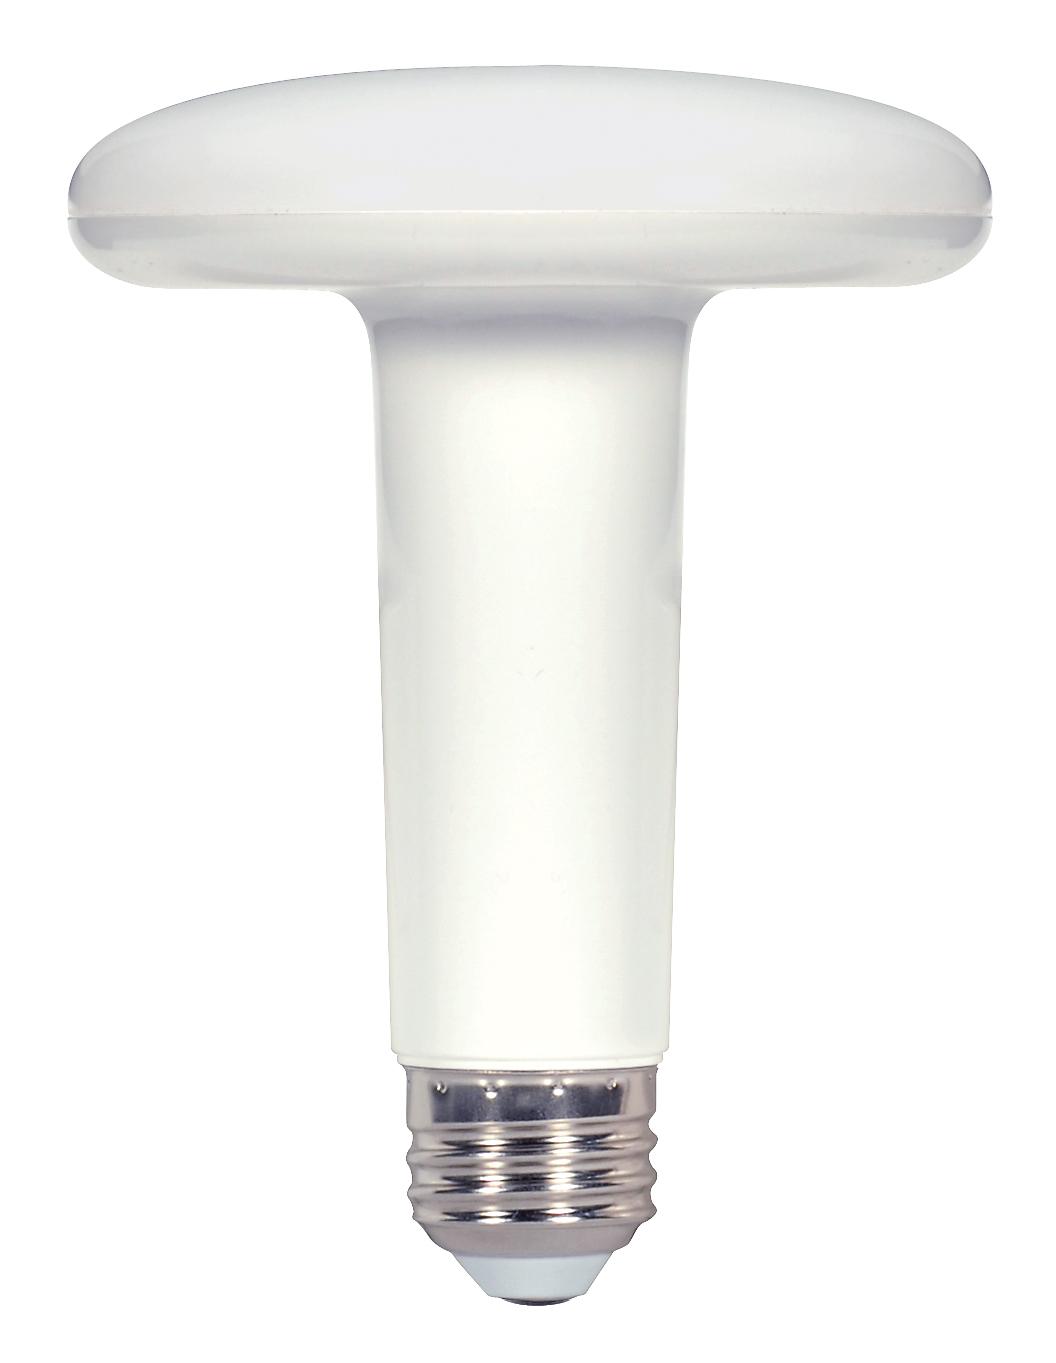 Satco,S9217,9BR30/LED/2700K/660L/120V/ND